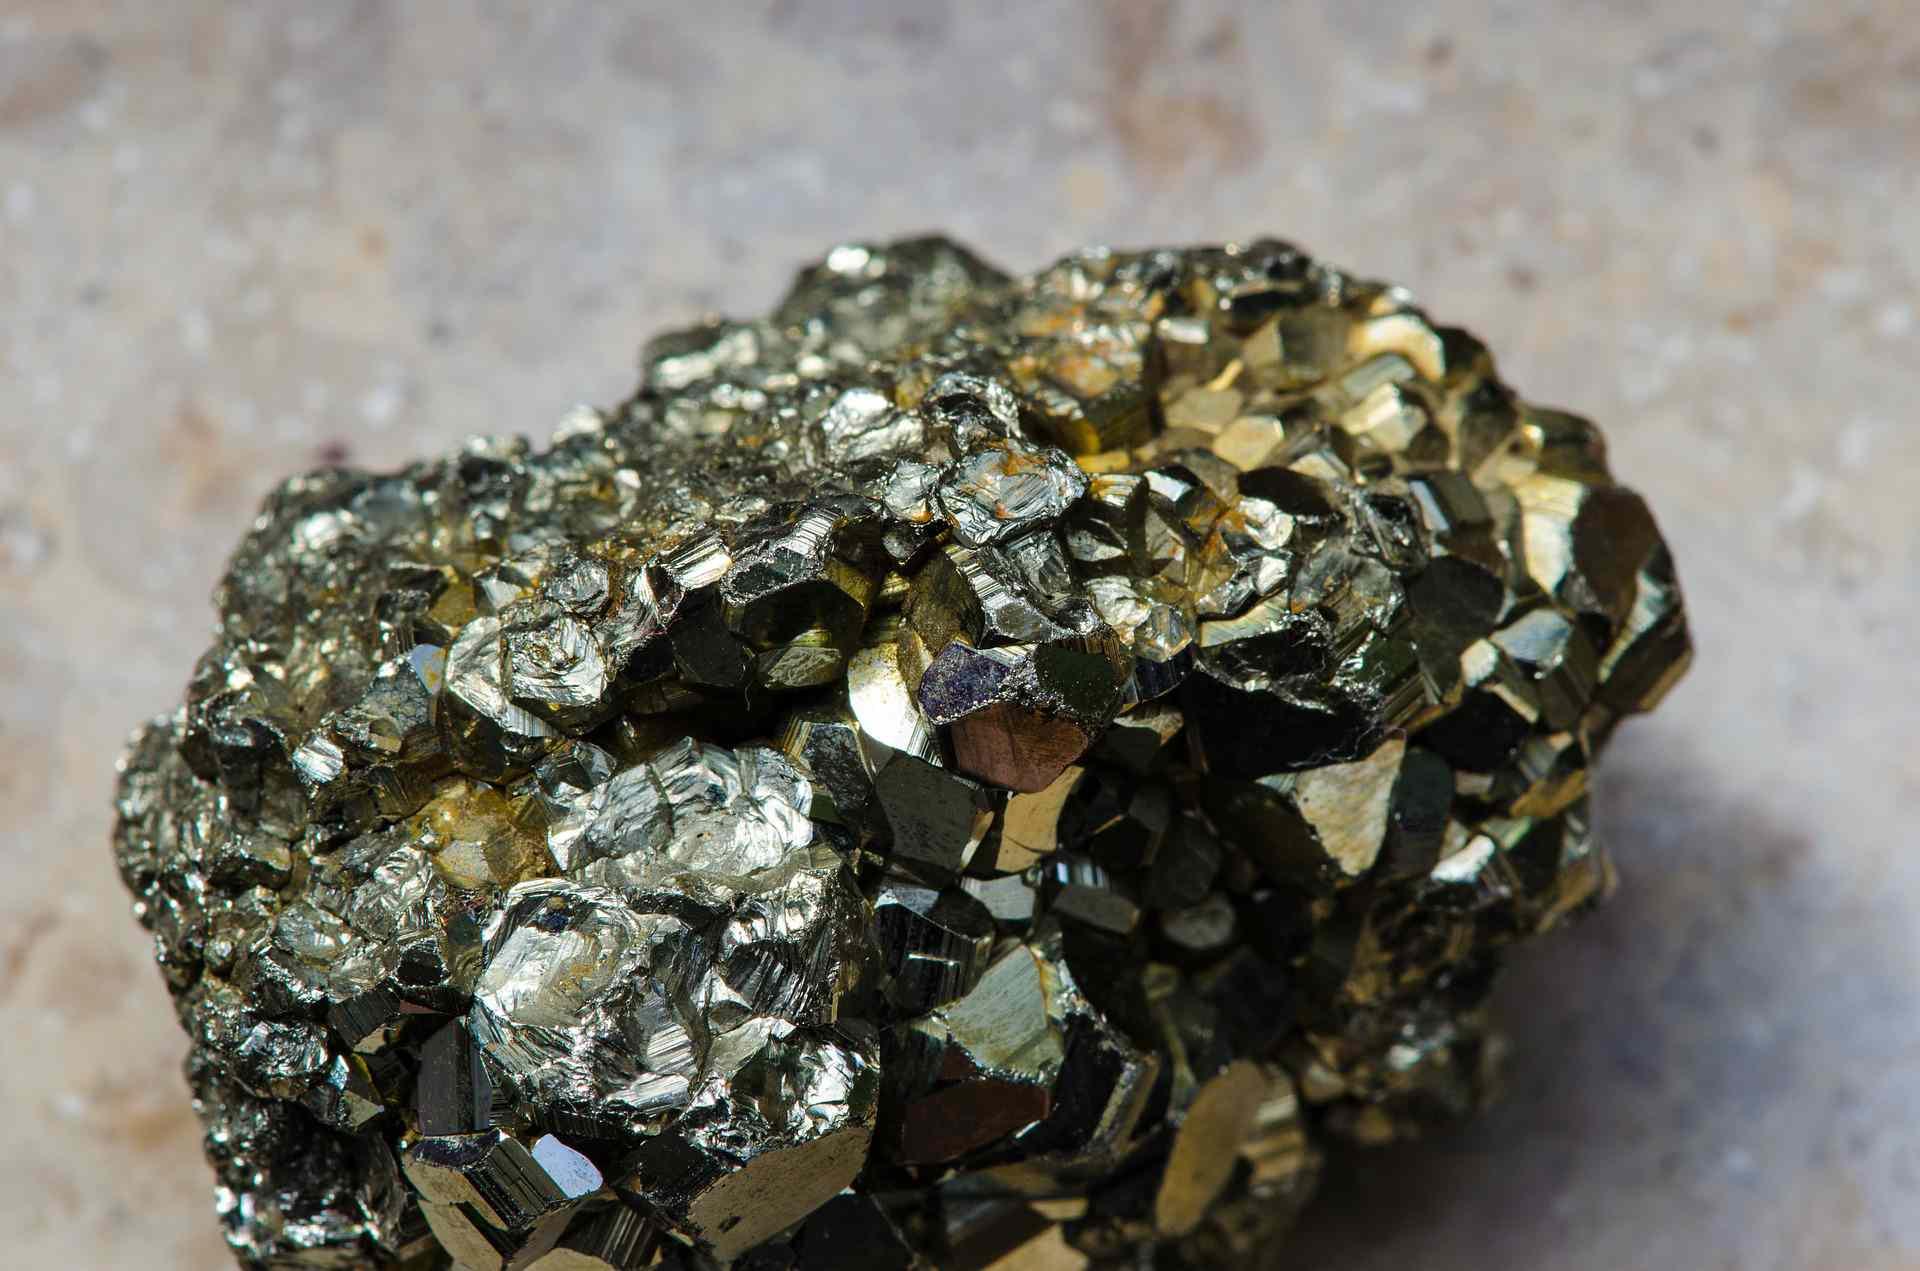 Shiny chunk of pyrite close up.